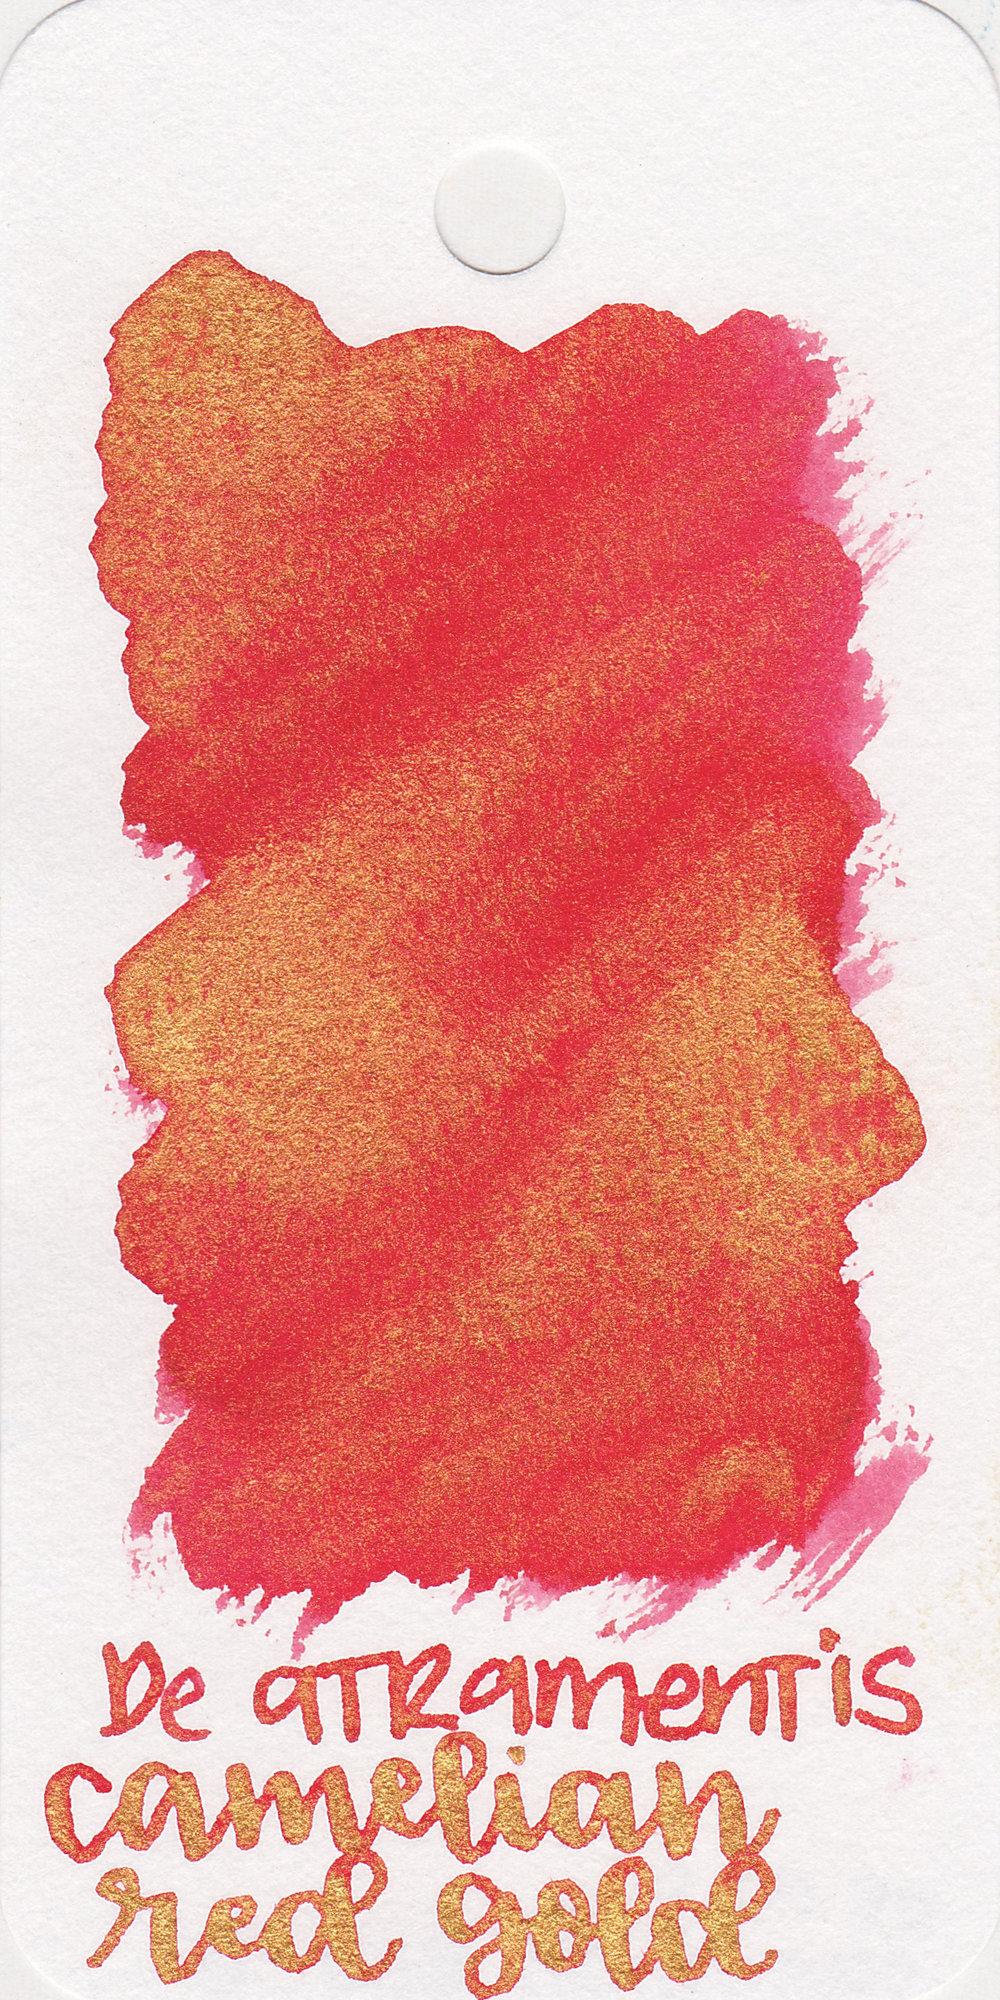 da-camelian-red-gold-1.jpg